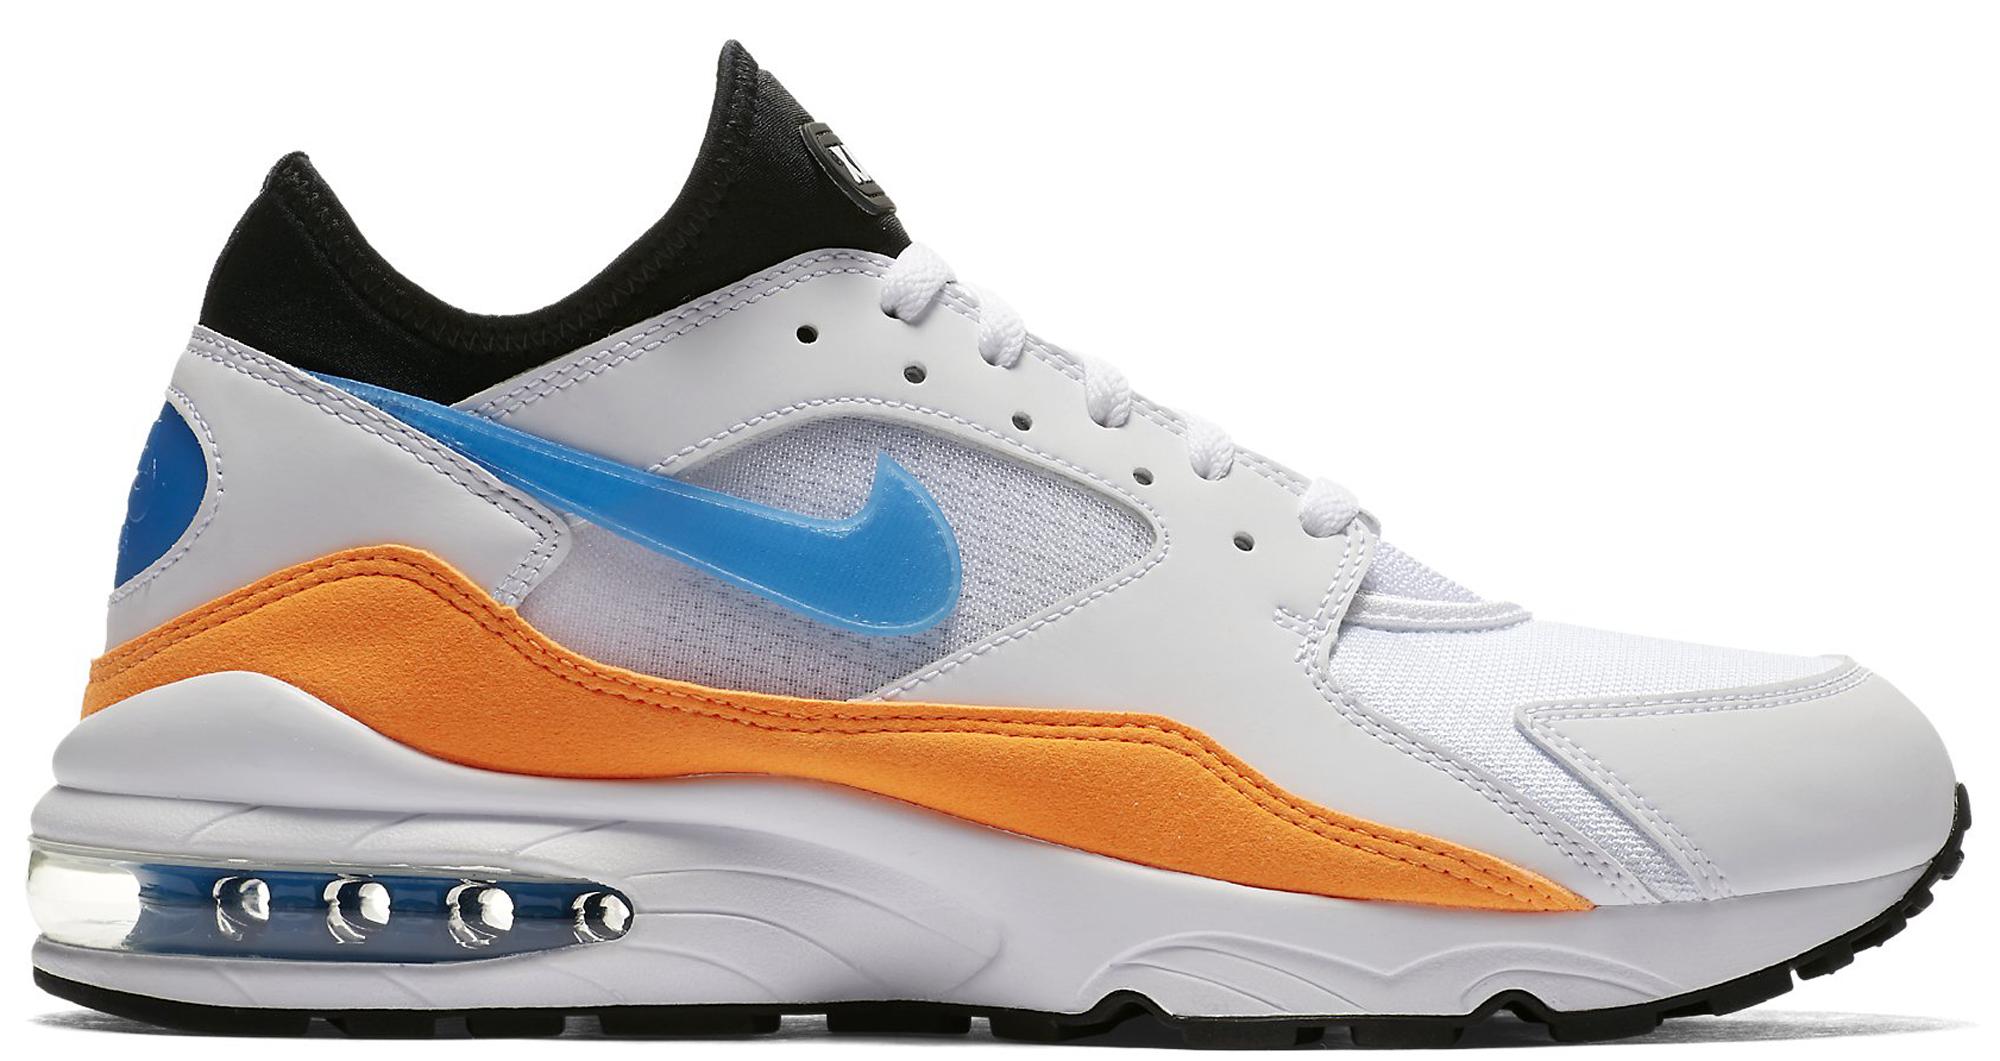 Nike Air Max 93 Nebula Blue Orange